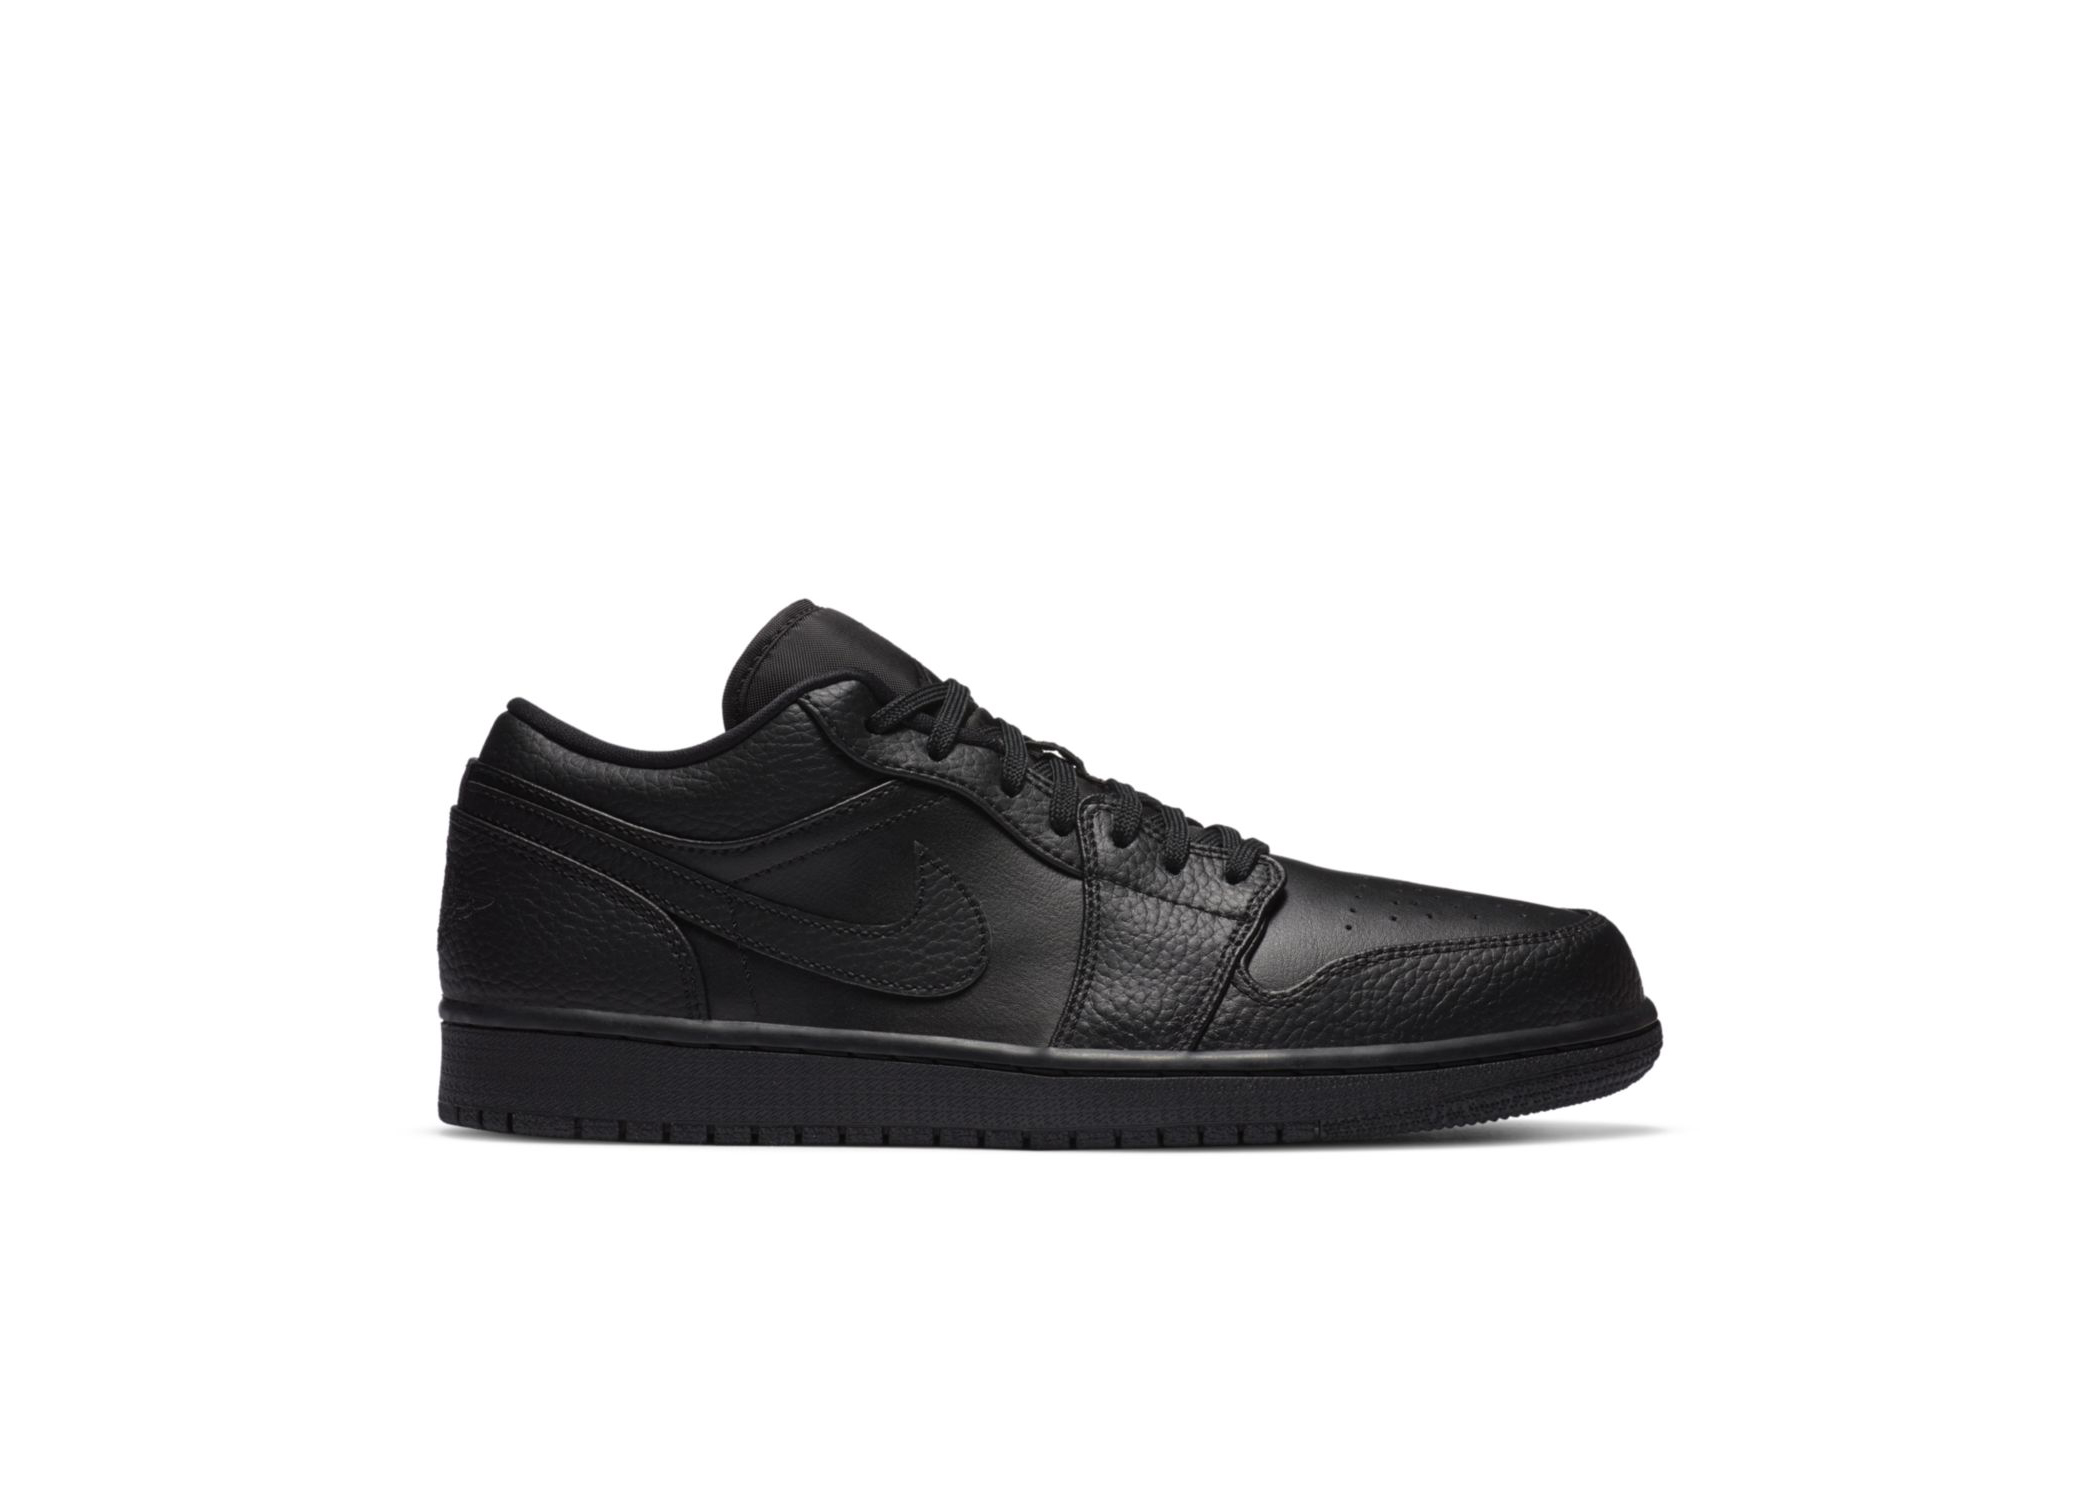 Jordan 1 Low Triple Black - 553558-091